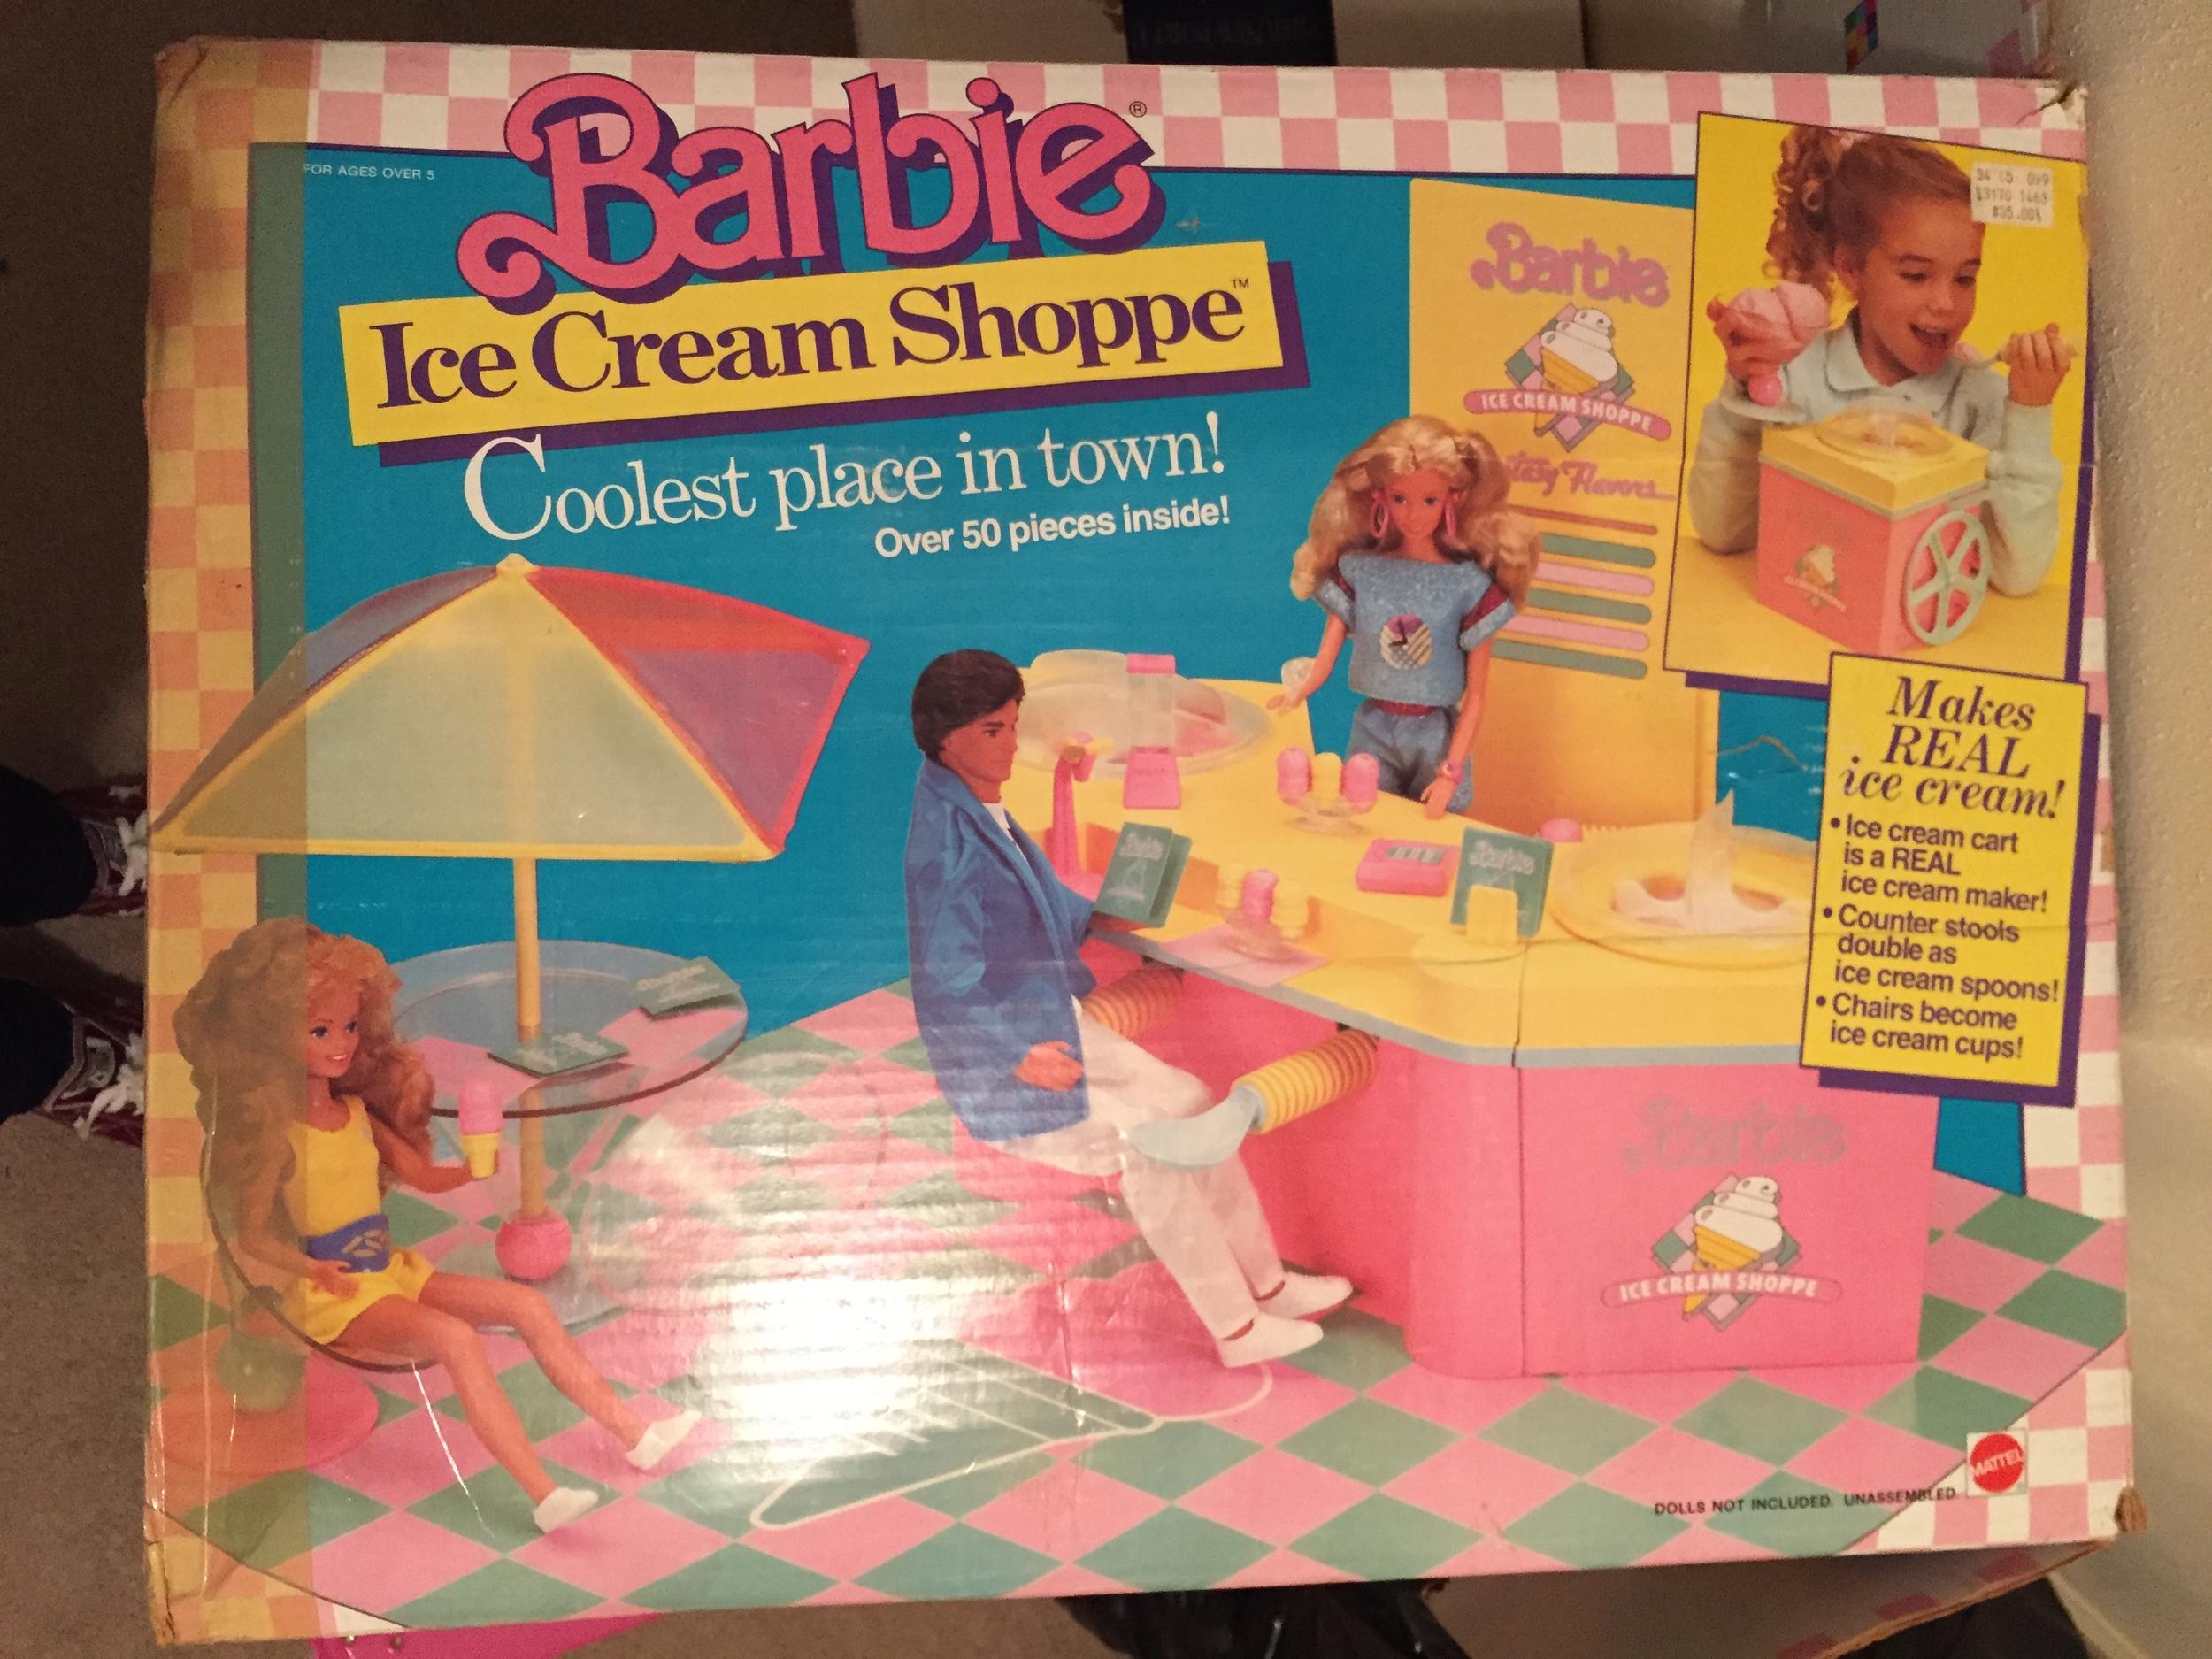 barbie ice cream shoppe